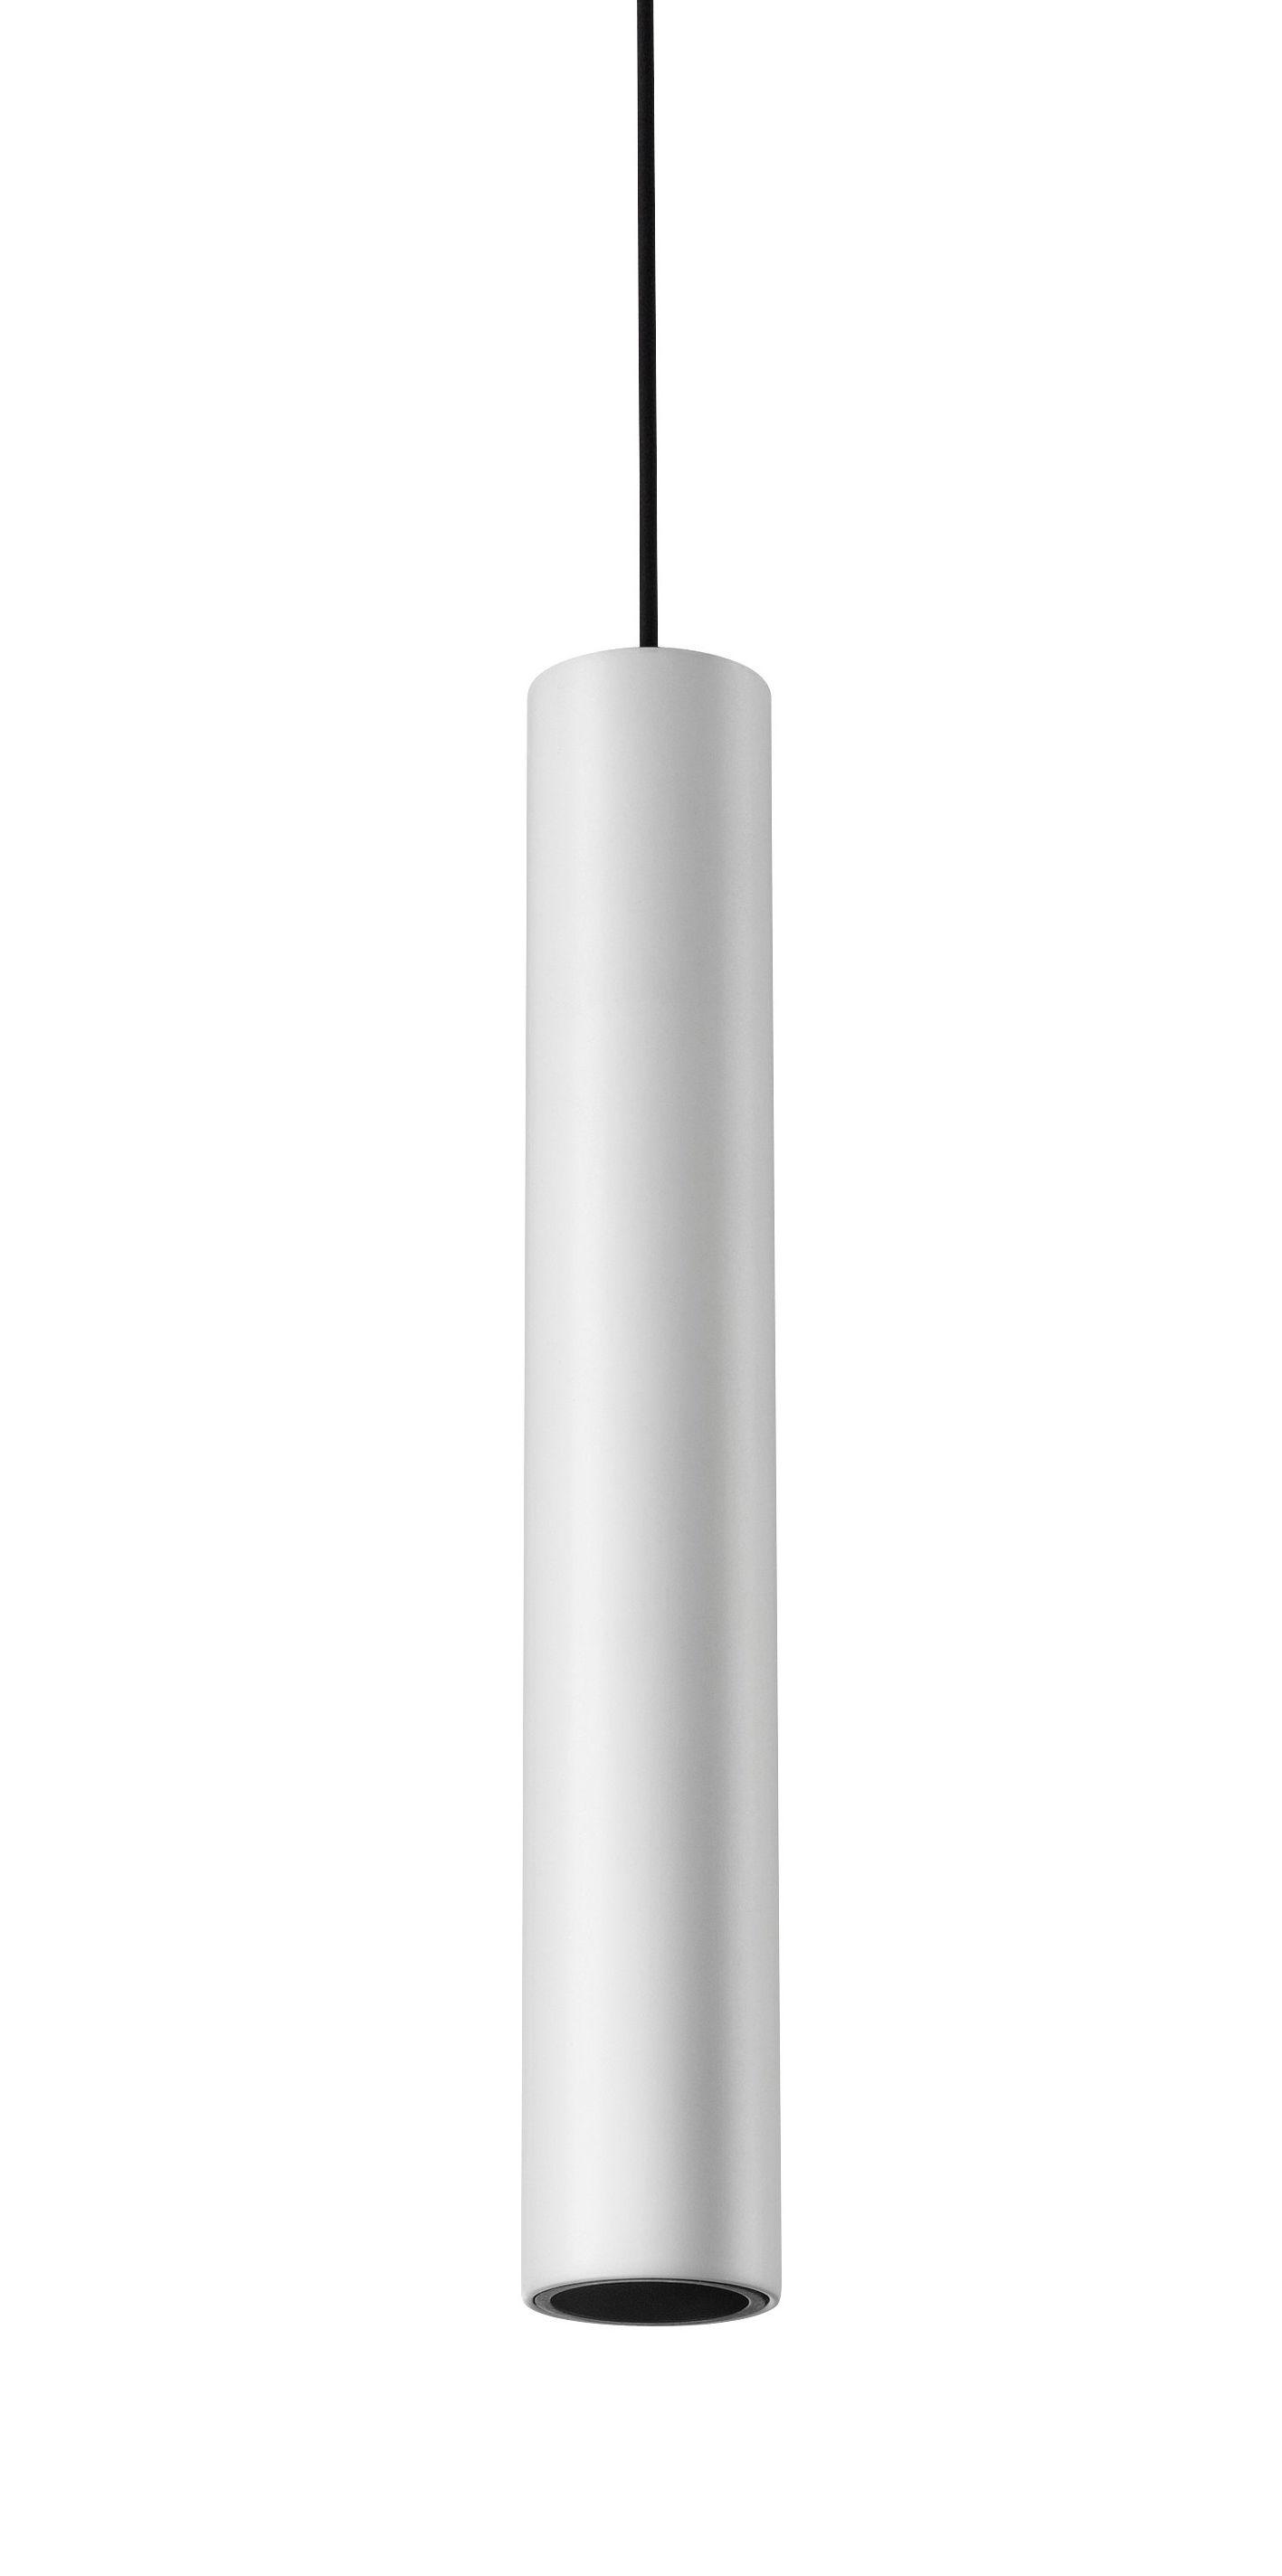 Illuminazione - Lampadari - Sospensione Find Me LED di Flos -  - Alluminio